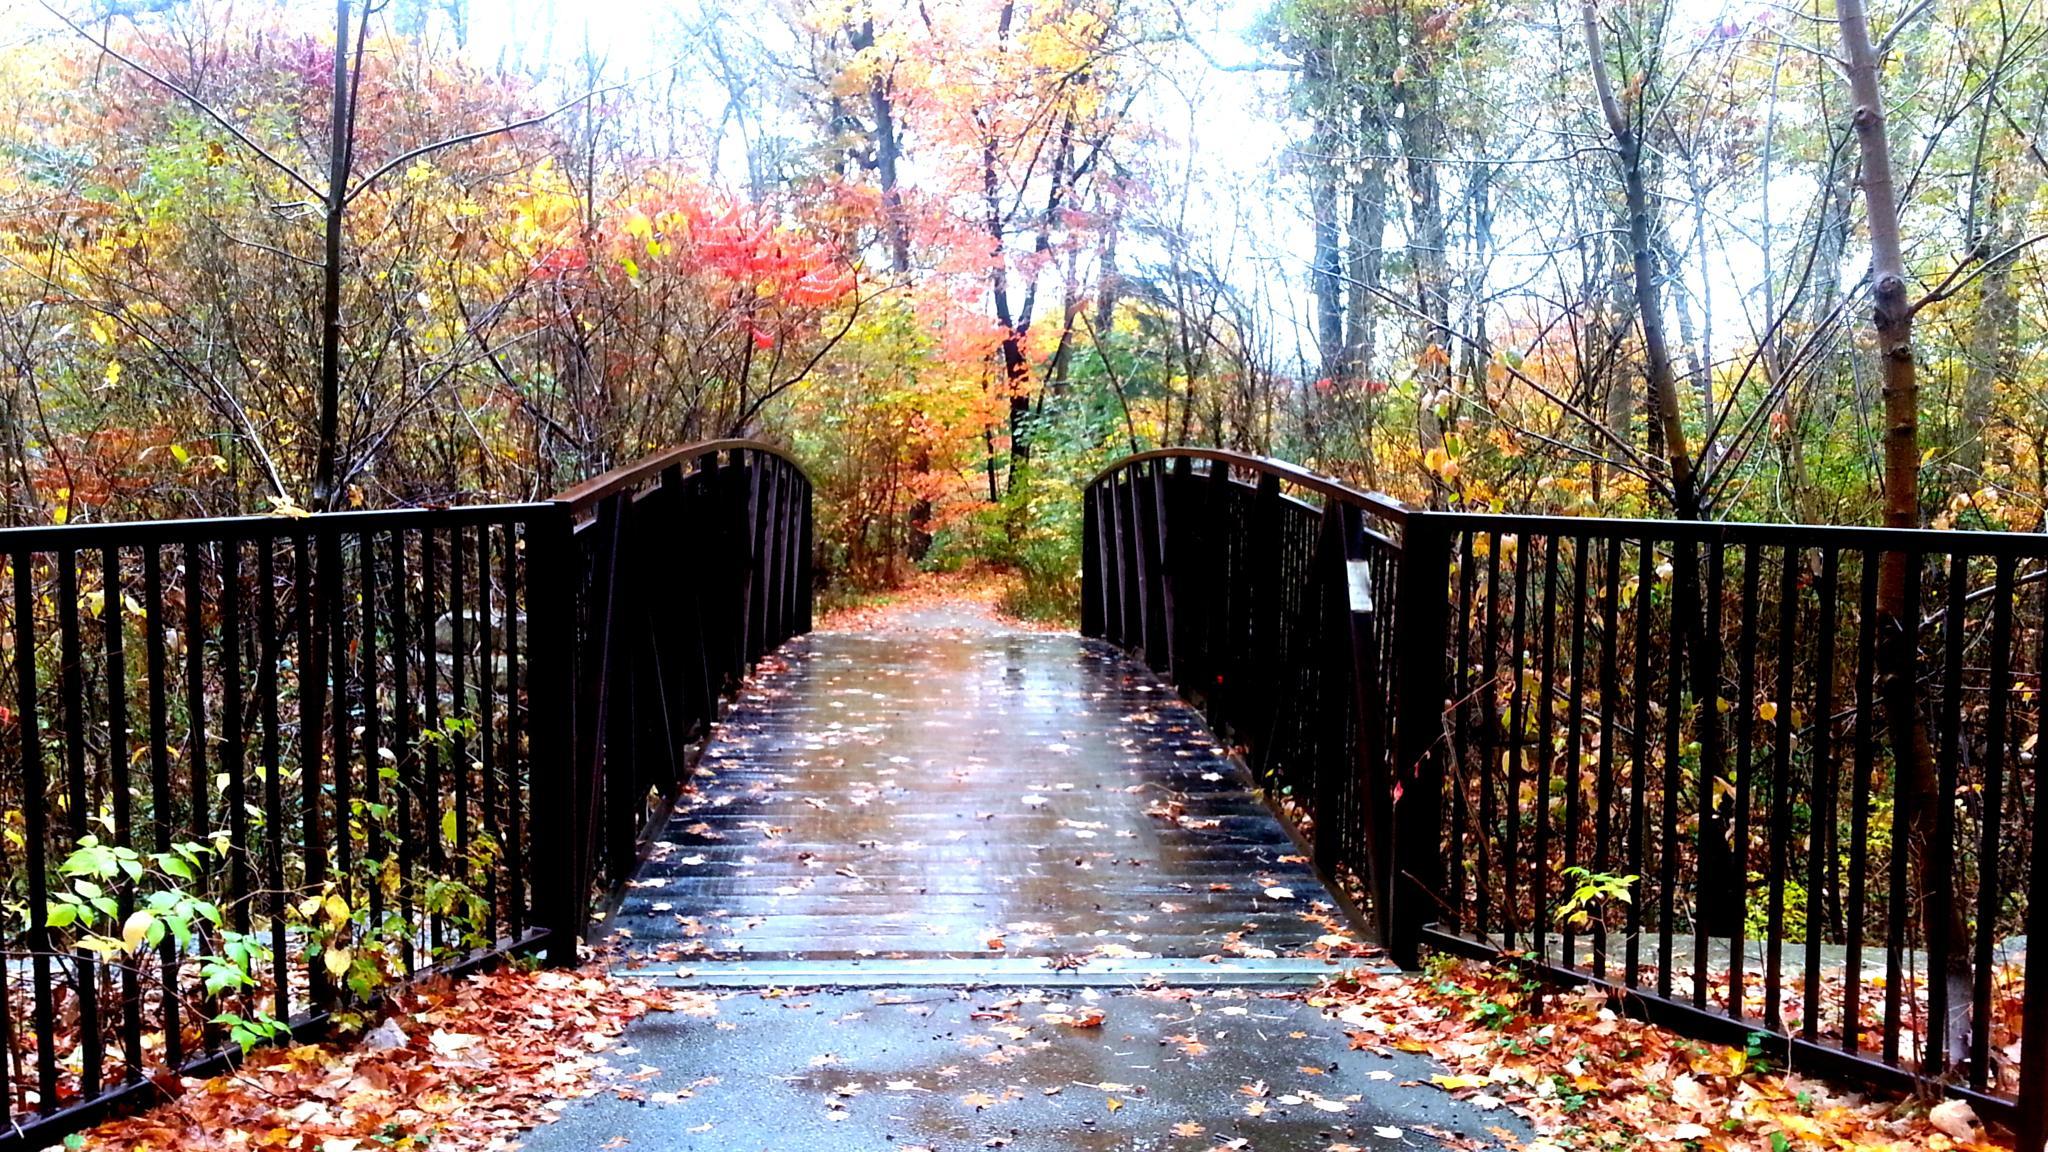 Rainy Fall Day by simonp